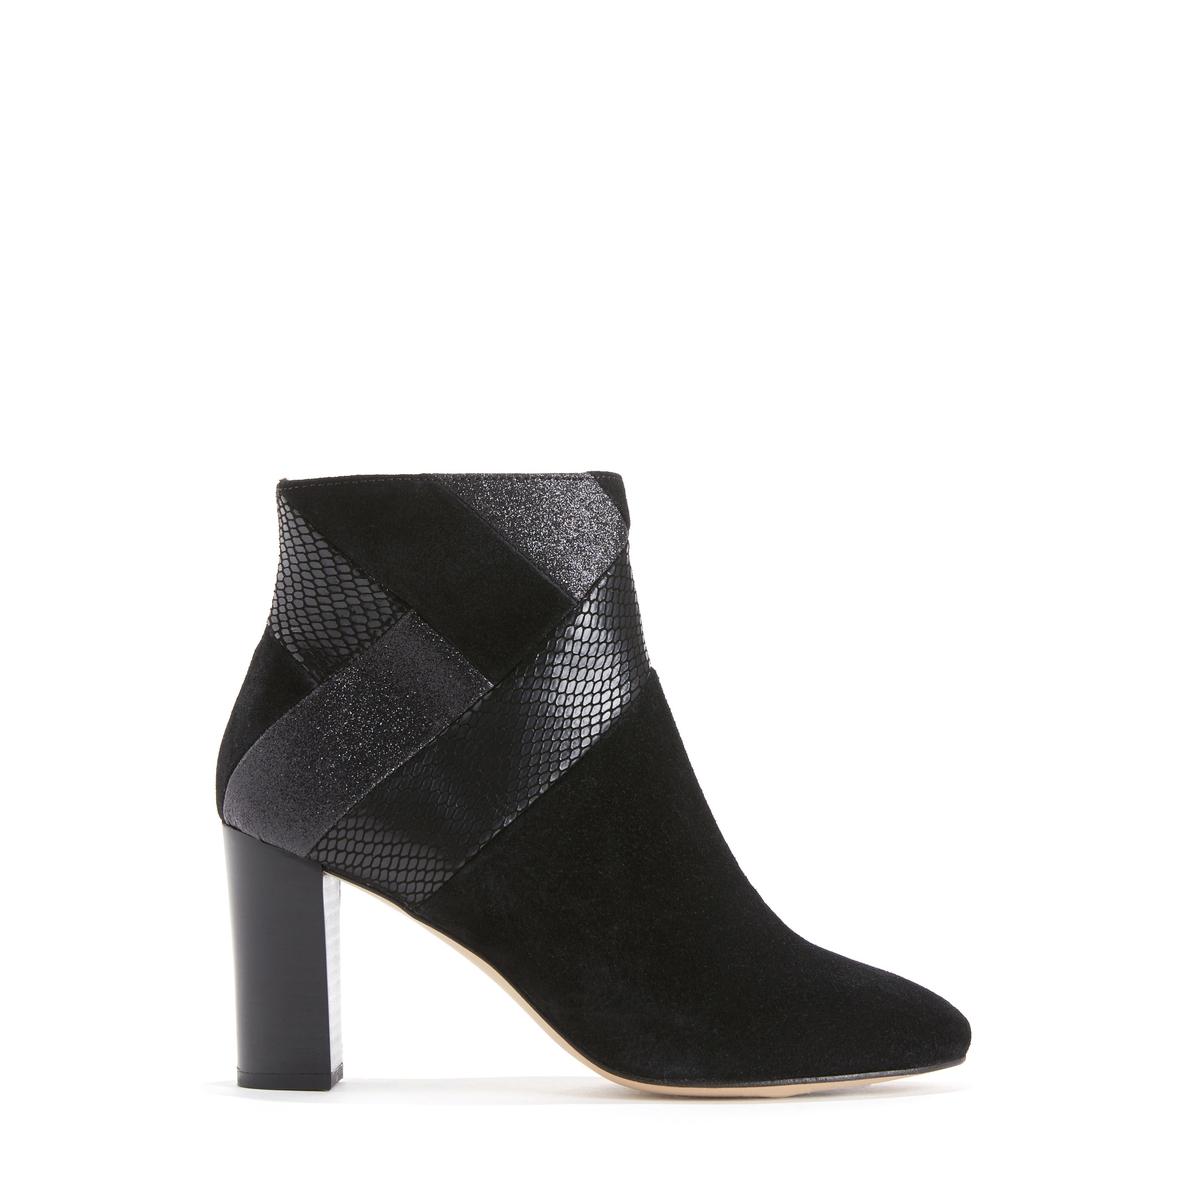 Ботильоны кожаные на высоком каблуке BURENNE цены онлайн